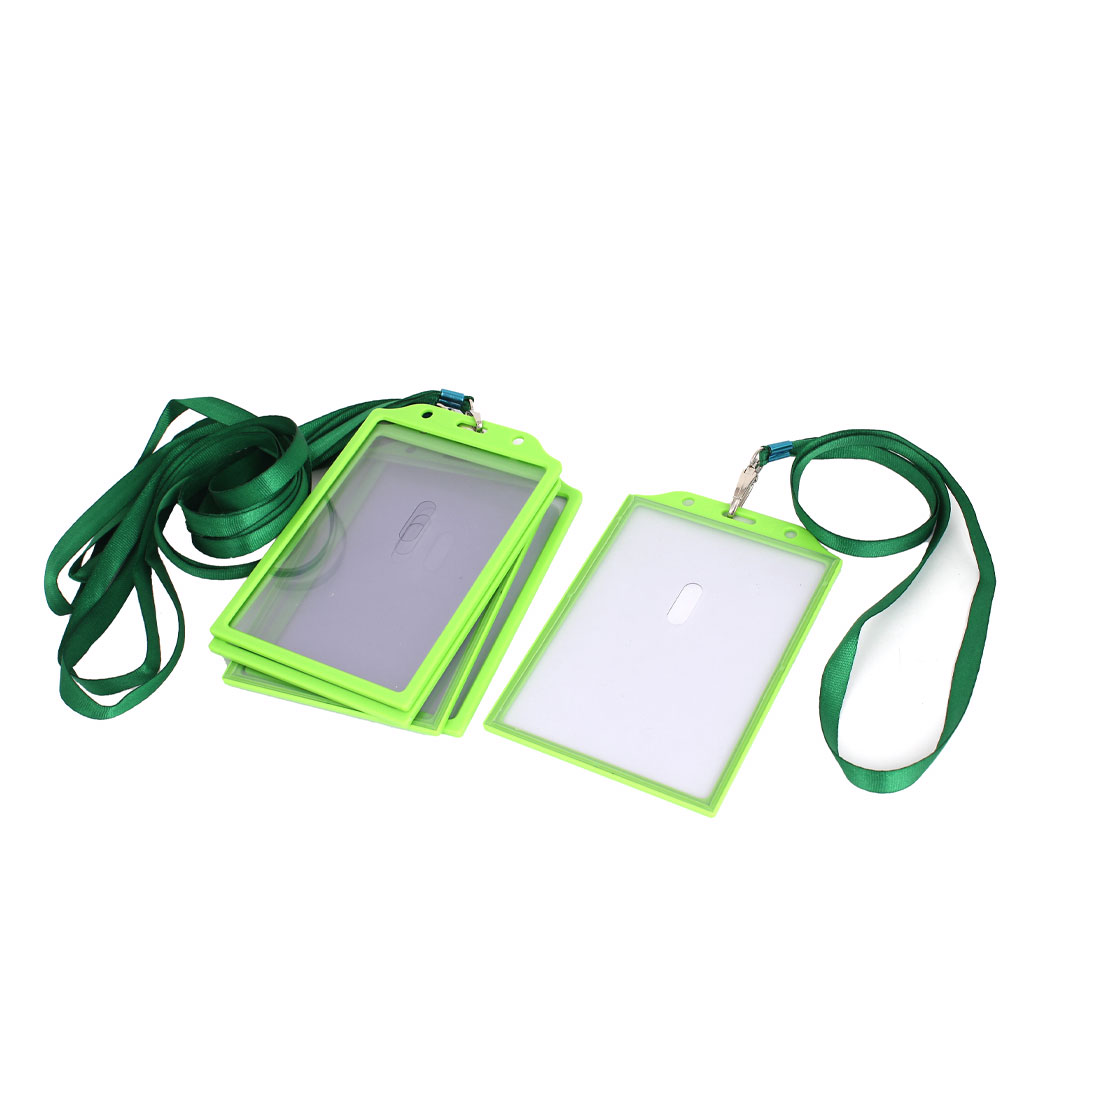 5Pcs Green Plastic Vertical Badge Lanyard ID Card Holder Pouch 8.5 x 11.8cm